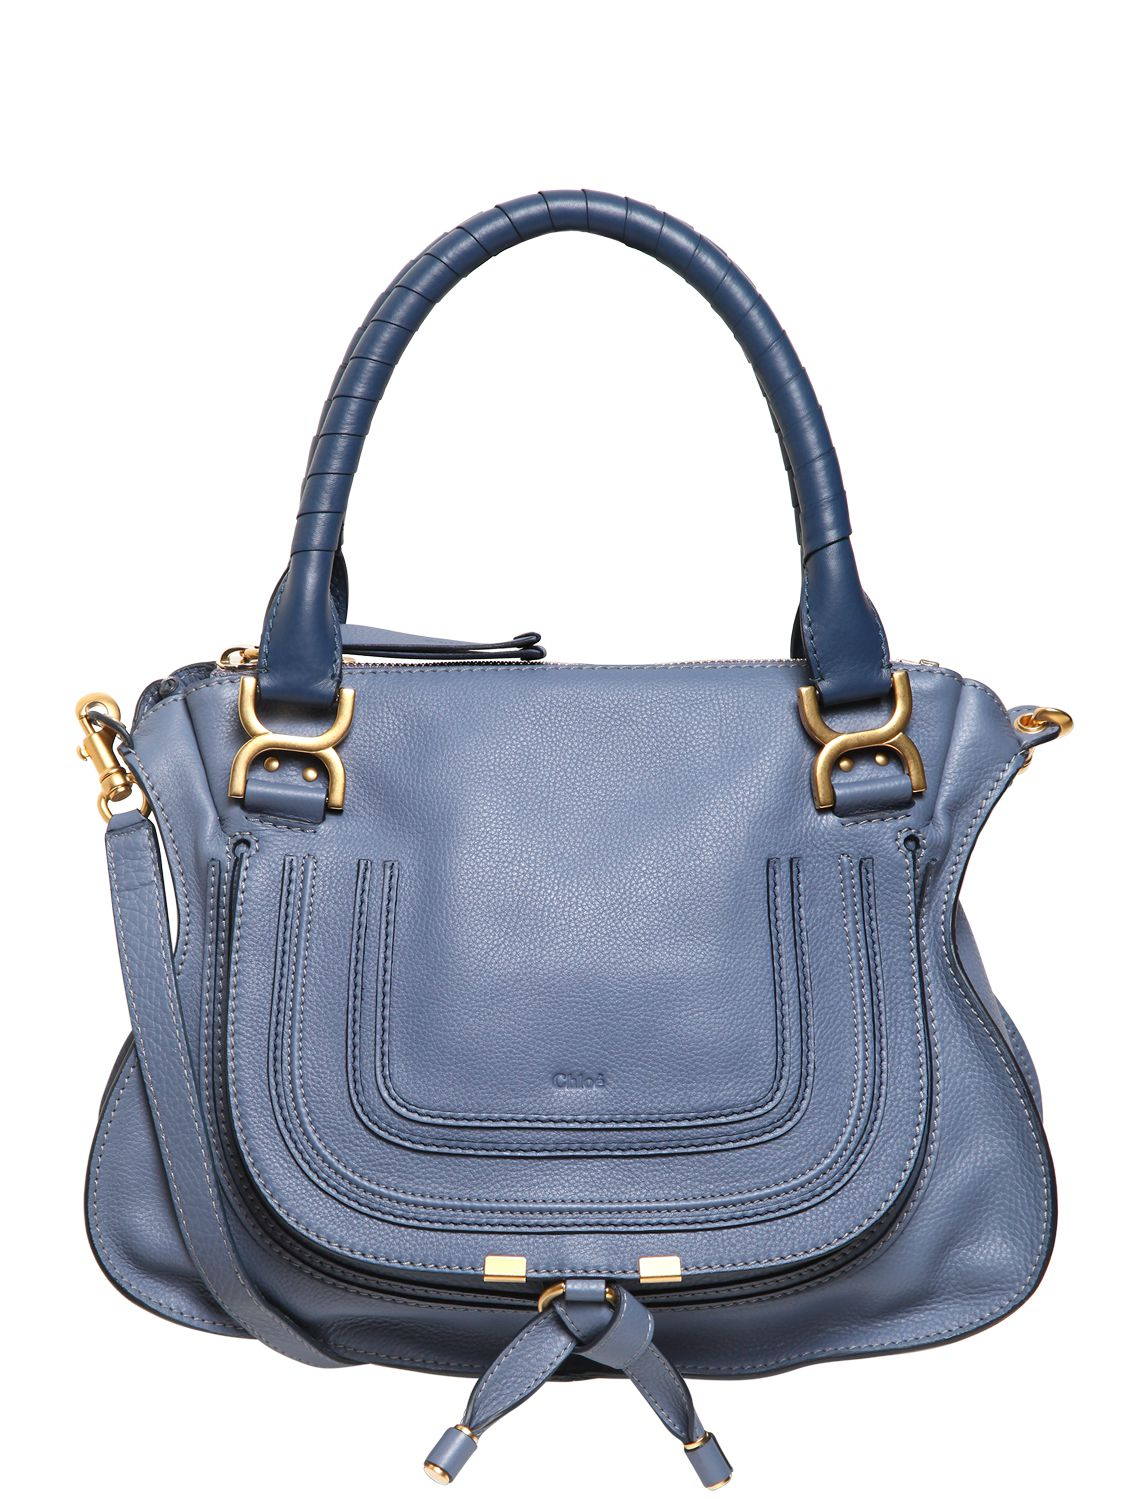 Chlo¨¦ Medium Marcie Textured Leather Bag in Blue (STREET BLUE) | Lyst